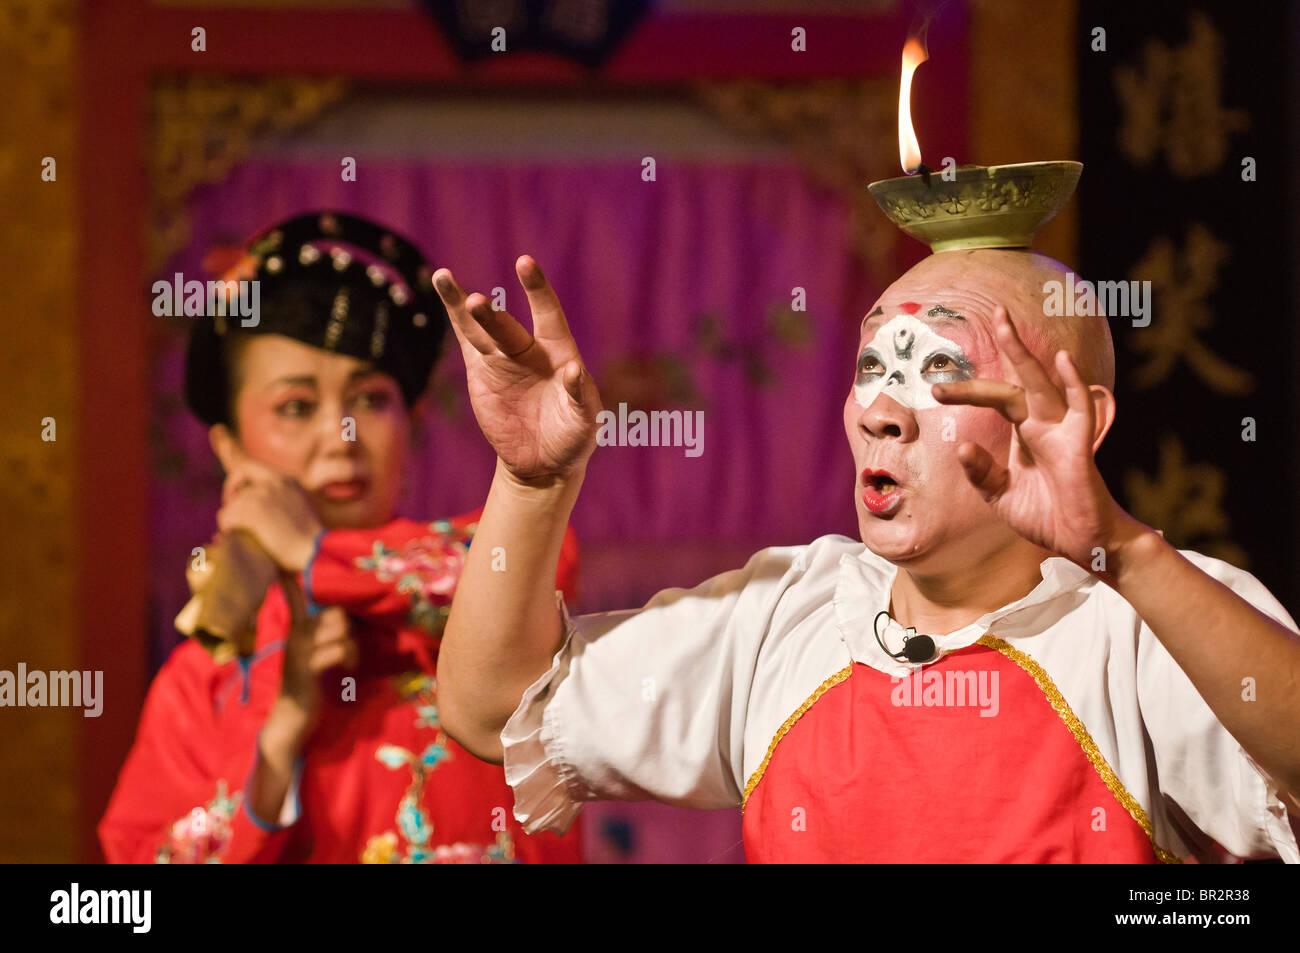 Schauspieler gleicht Öllampe in Sichuan Oper am Shufenyayuan Teehaus, Chengdu, Provinz Sichuan, China Stockbild